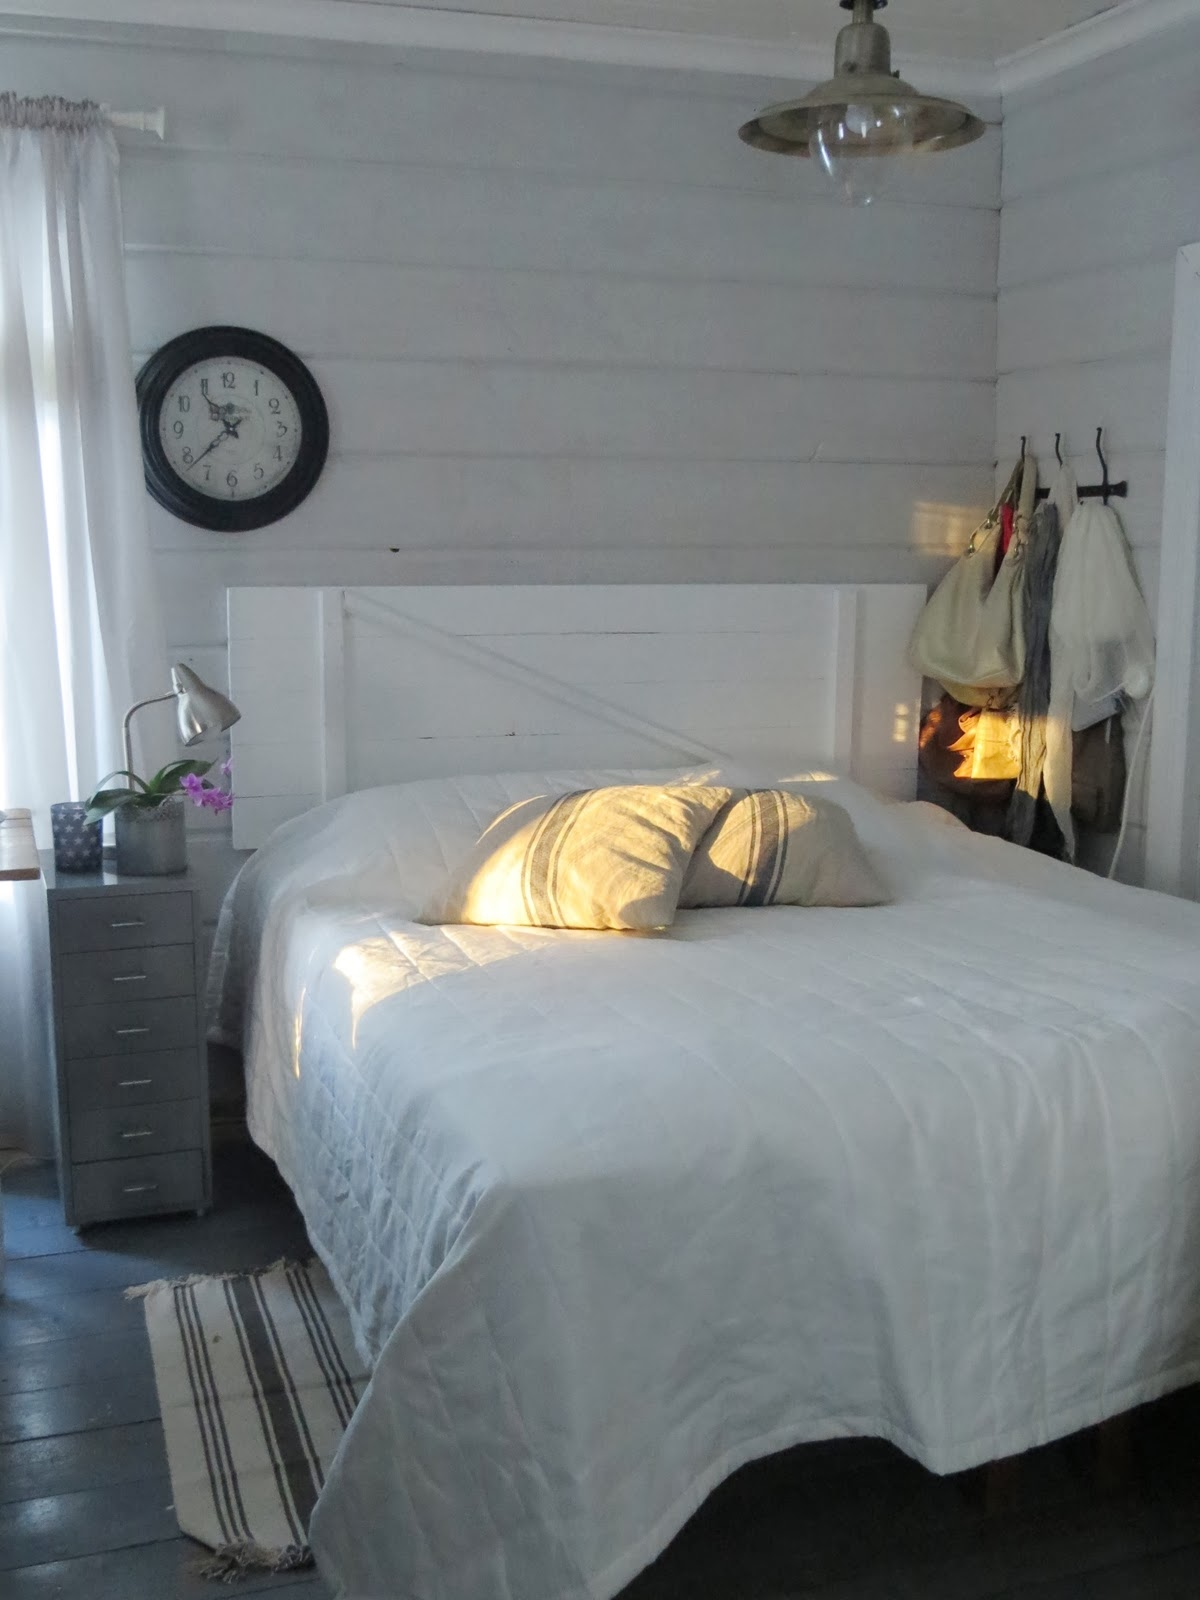 120cm leveä sänky Heddas: Sänky 120cm leveä sänky